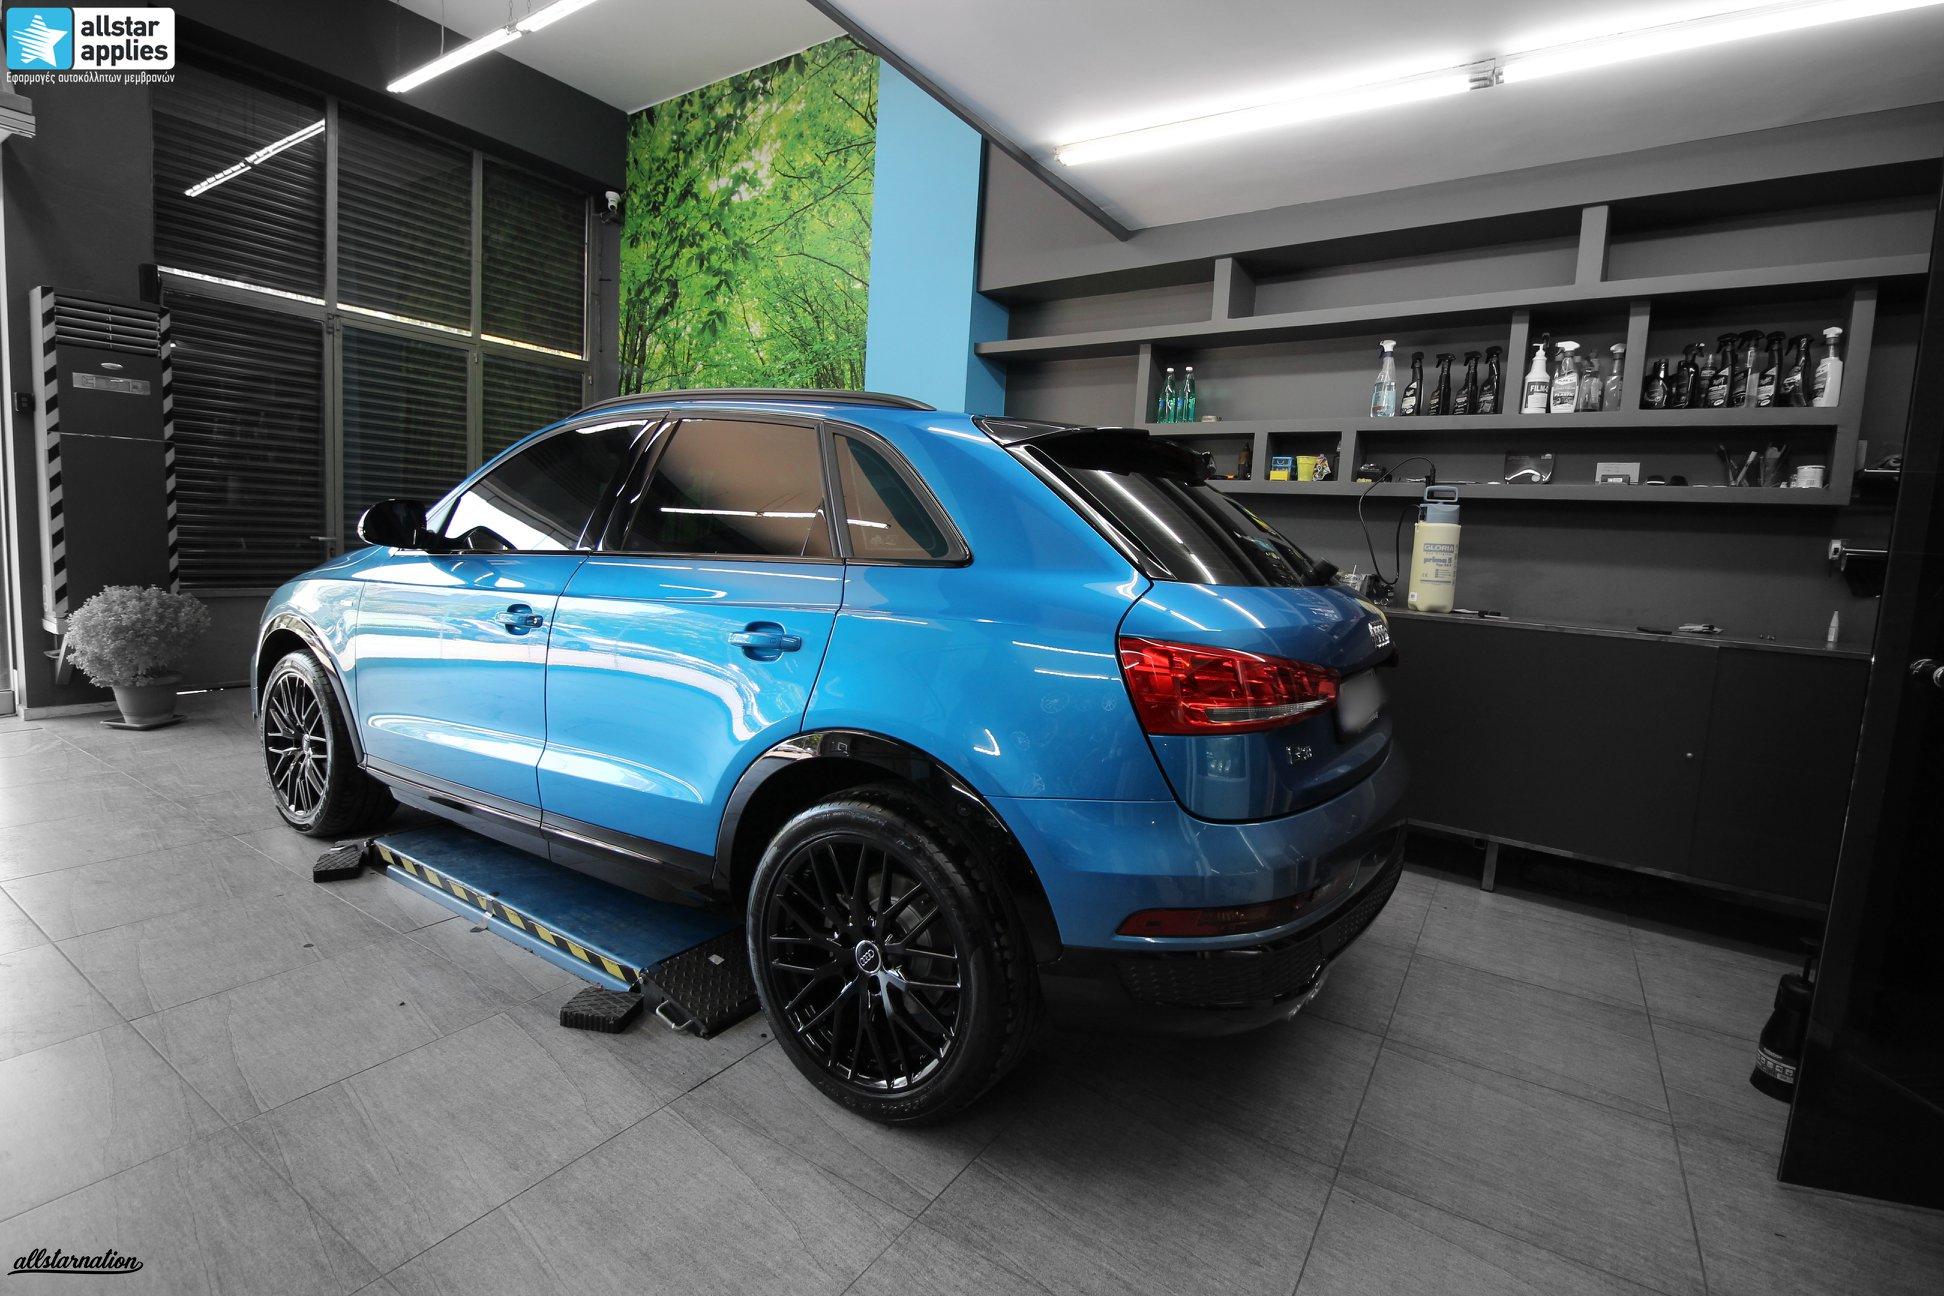 Audi Q3 – Μεμβράνες προστασίας χρώματος (Full Paint Protection Film) (4)